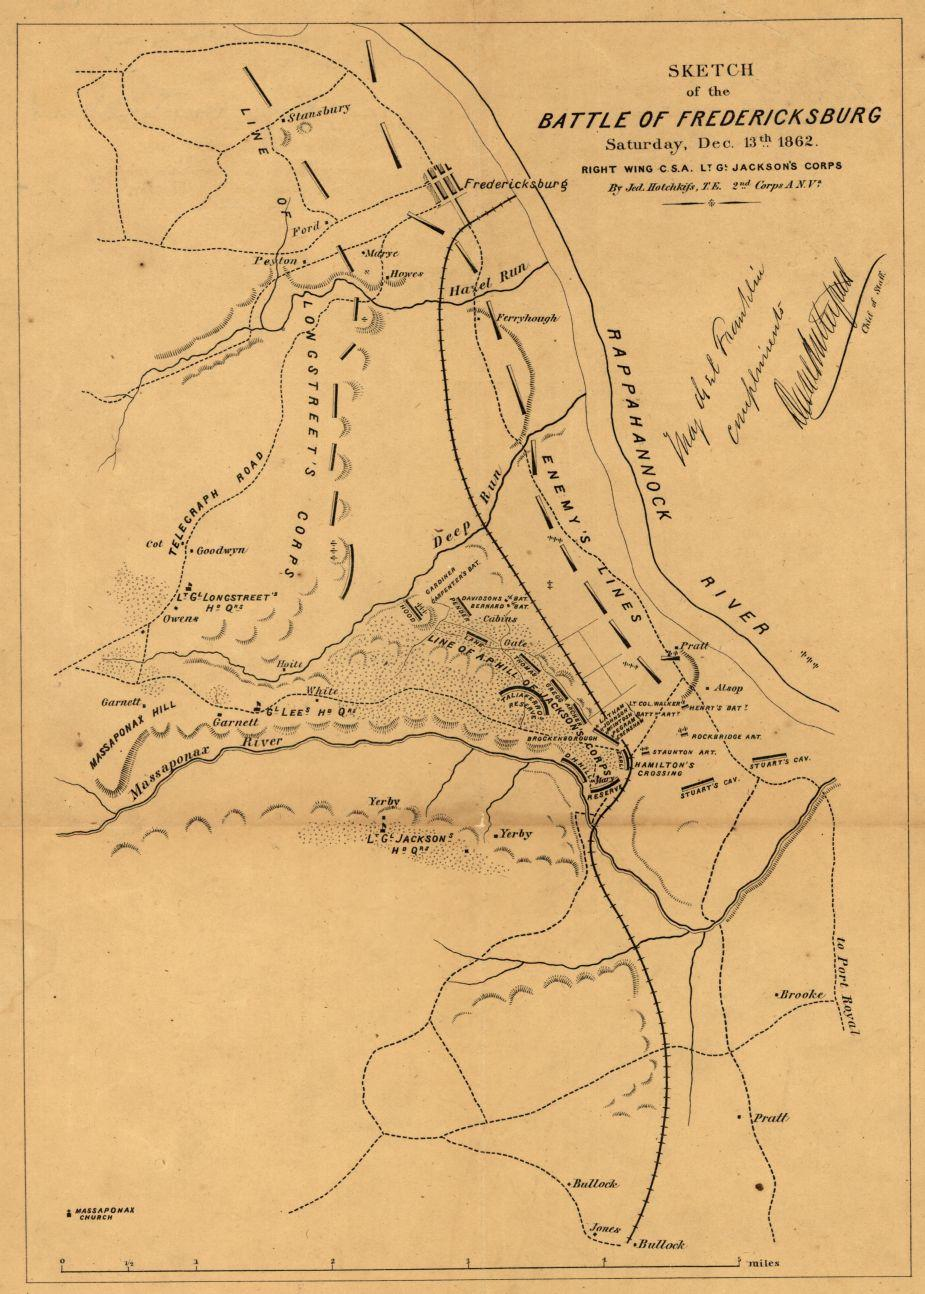 Sketch of the battle of Fredericksburg